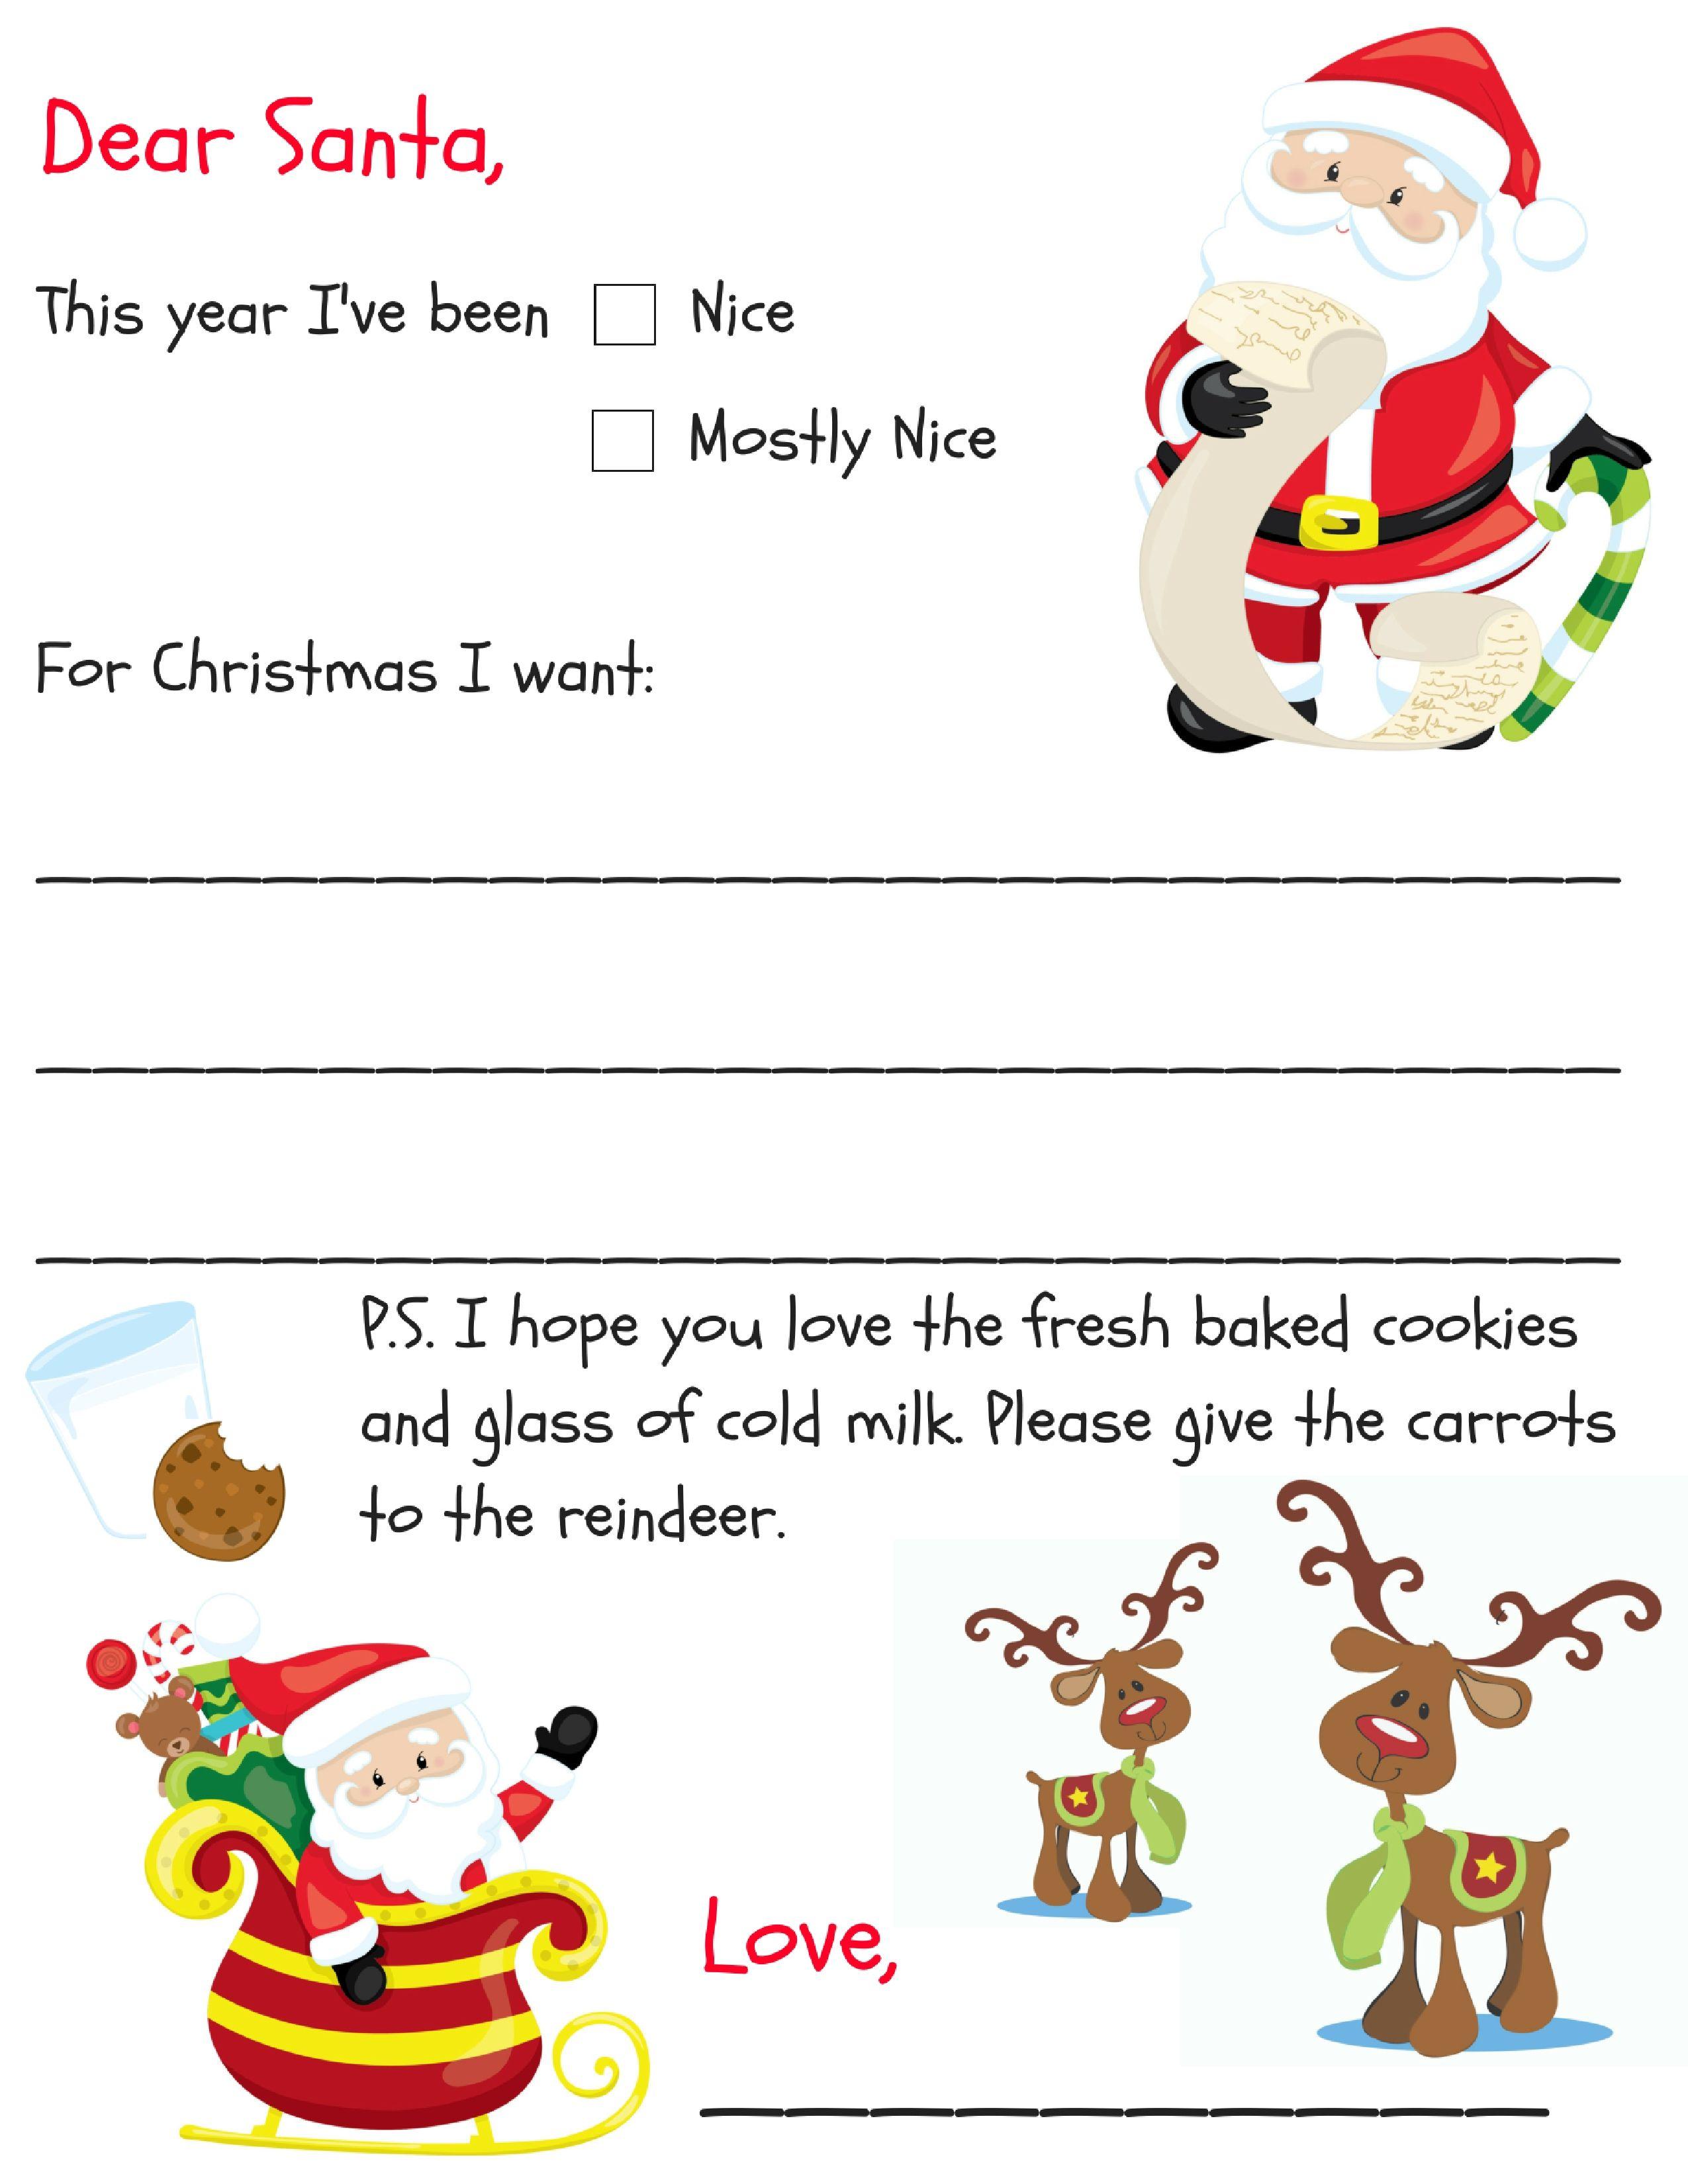 Free Printable Dear Santa Letter DearSanta